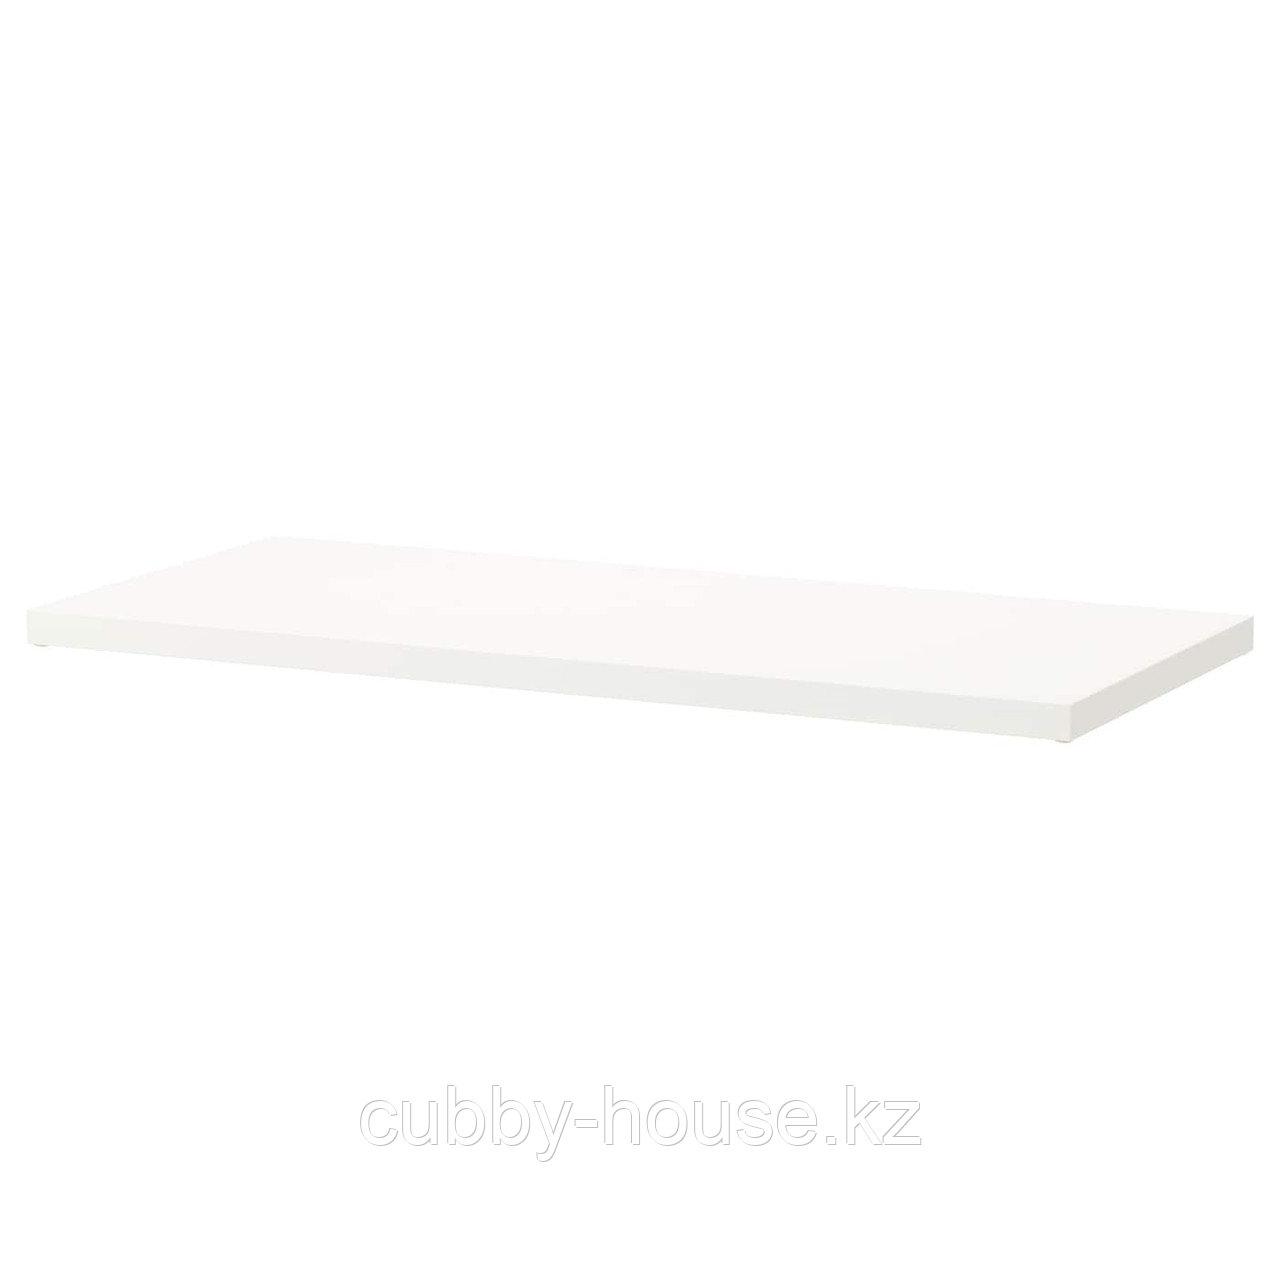 ЭЛВАРЛИ Полка, белый, 80x51 см